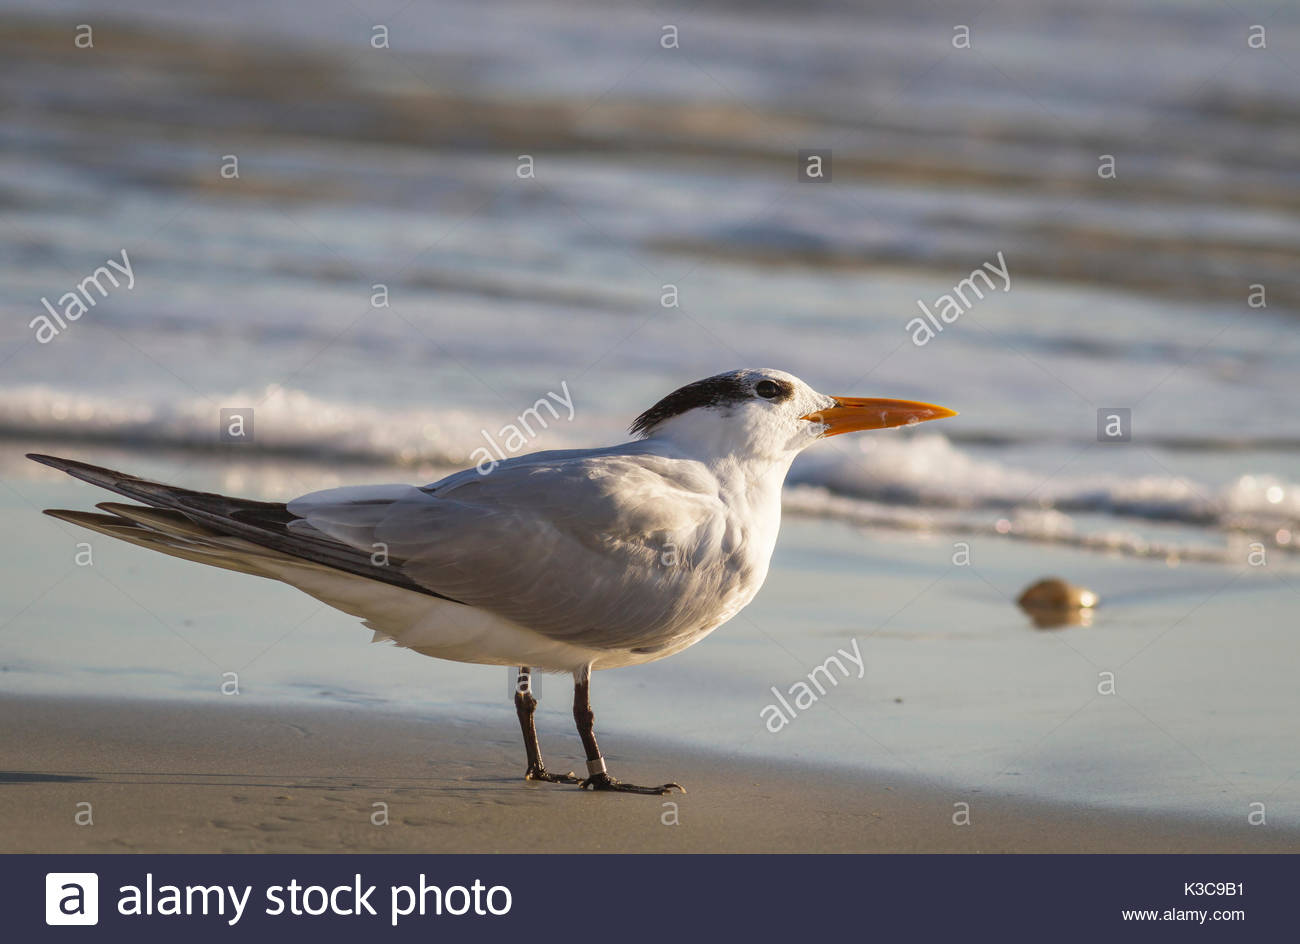 A sunlite Royal Tern (Thalasseus maximus) with a leg identification